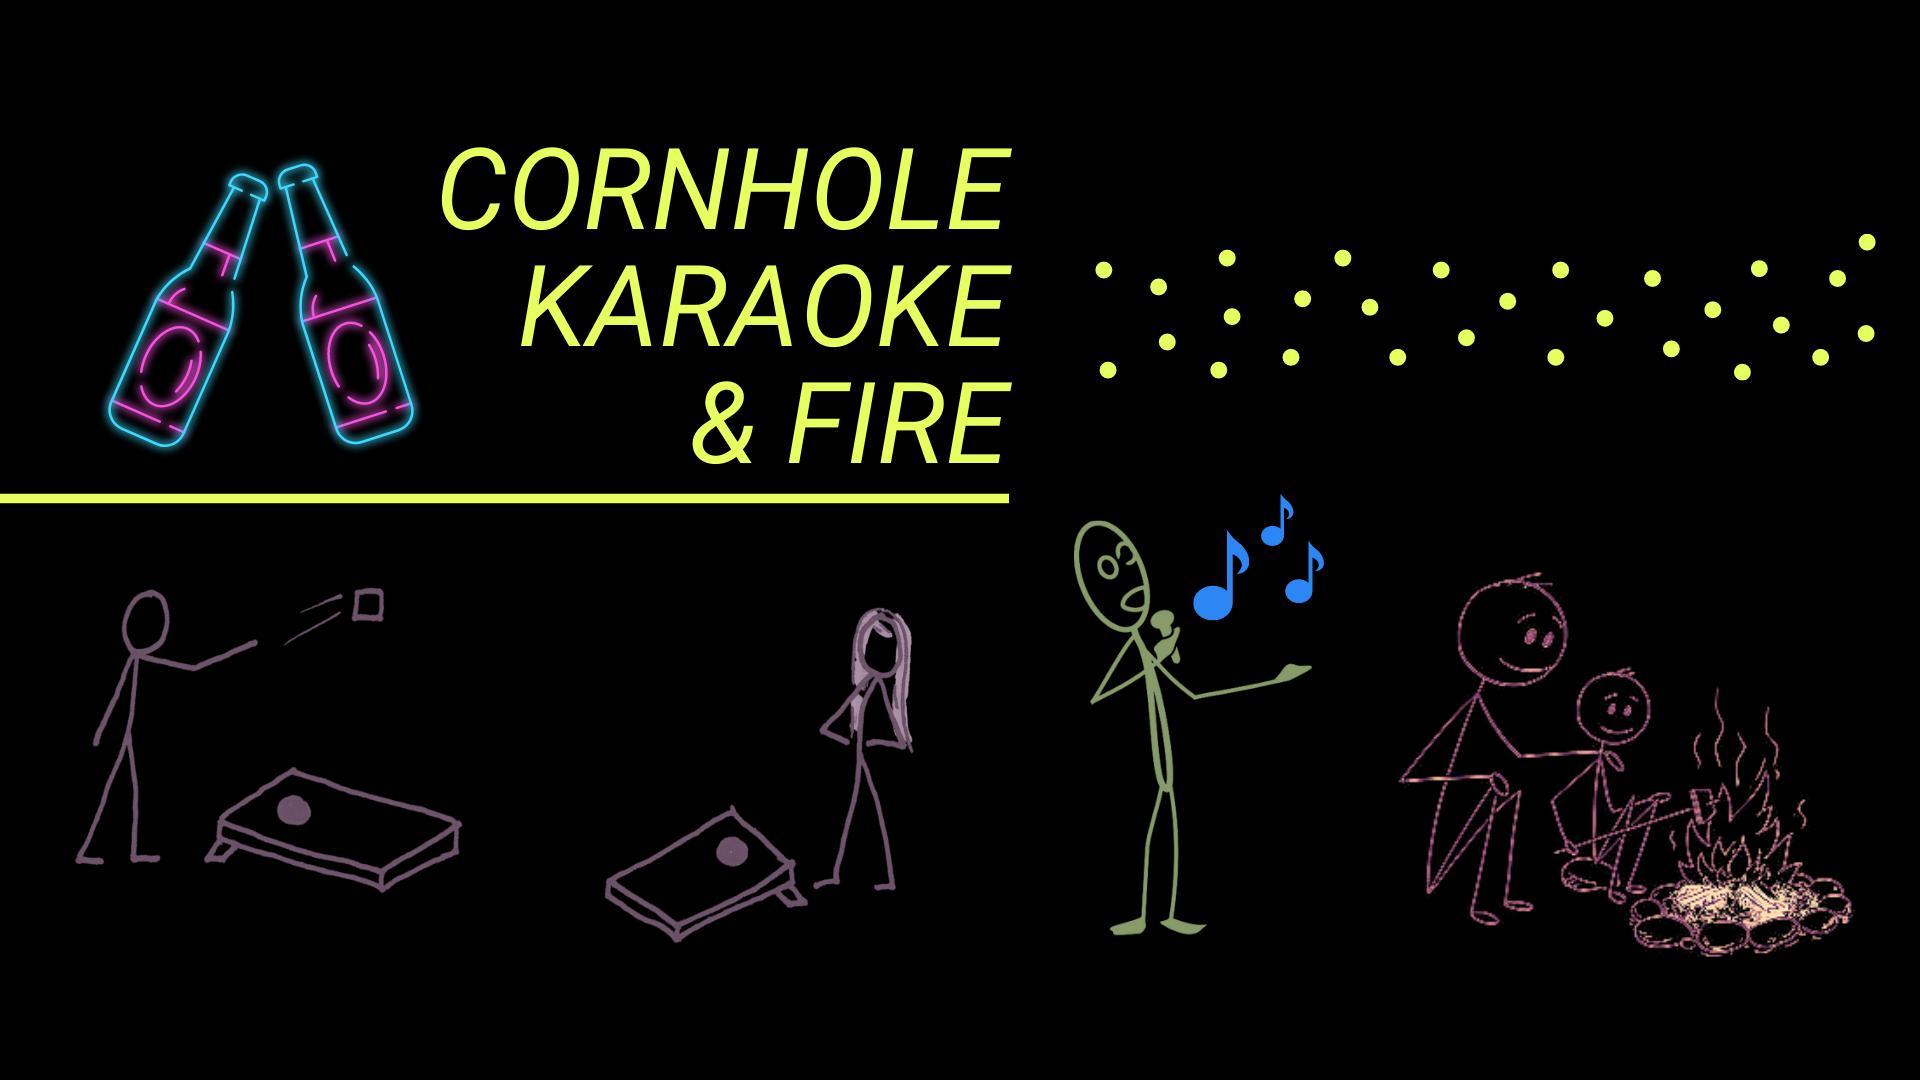 Cornhole, karoake, & fire